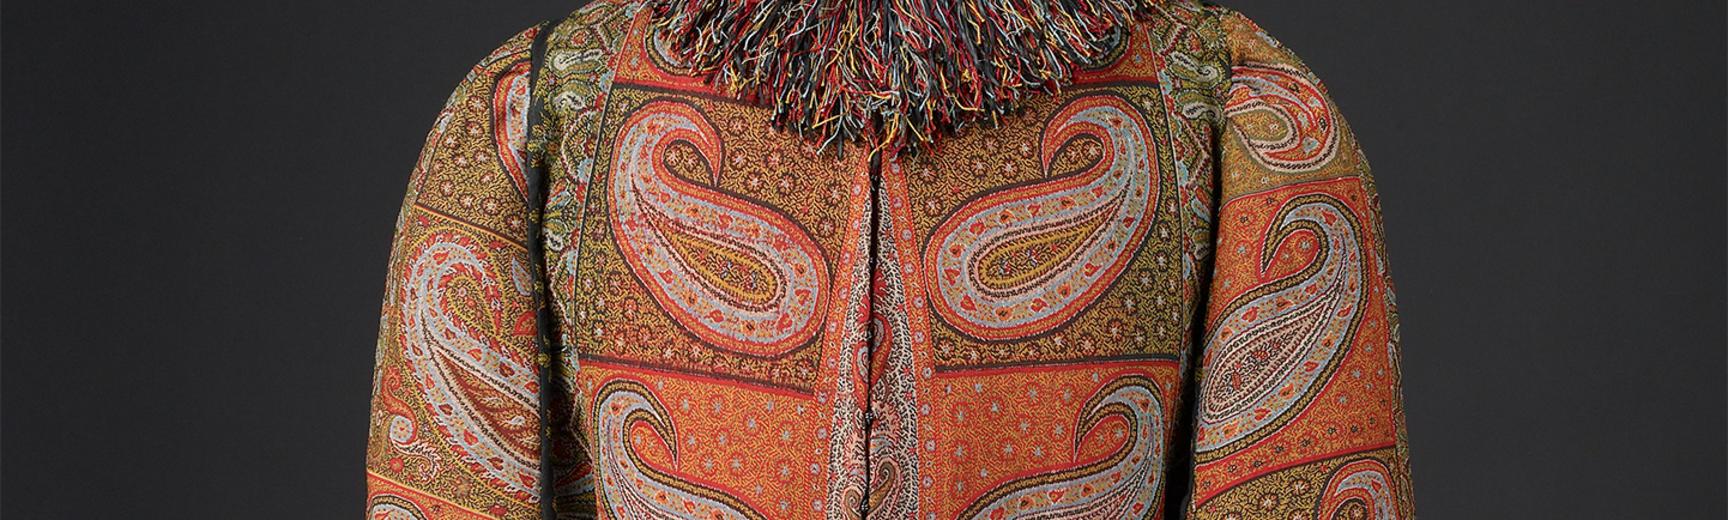 A winter kashmir shawl with fringed collar